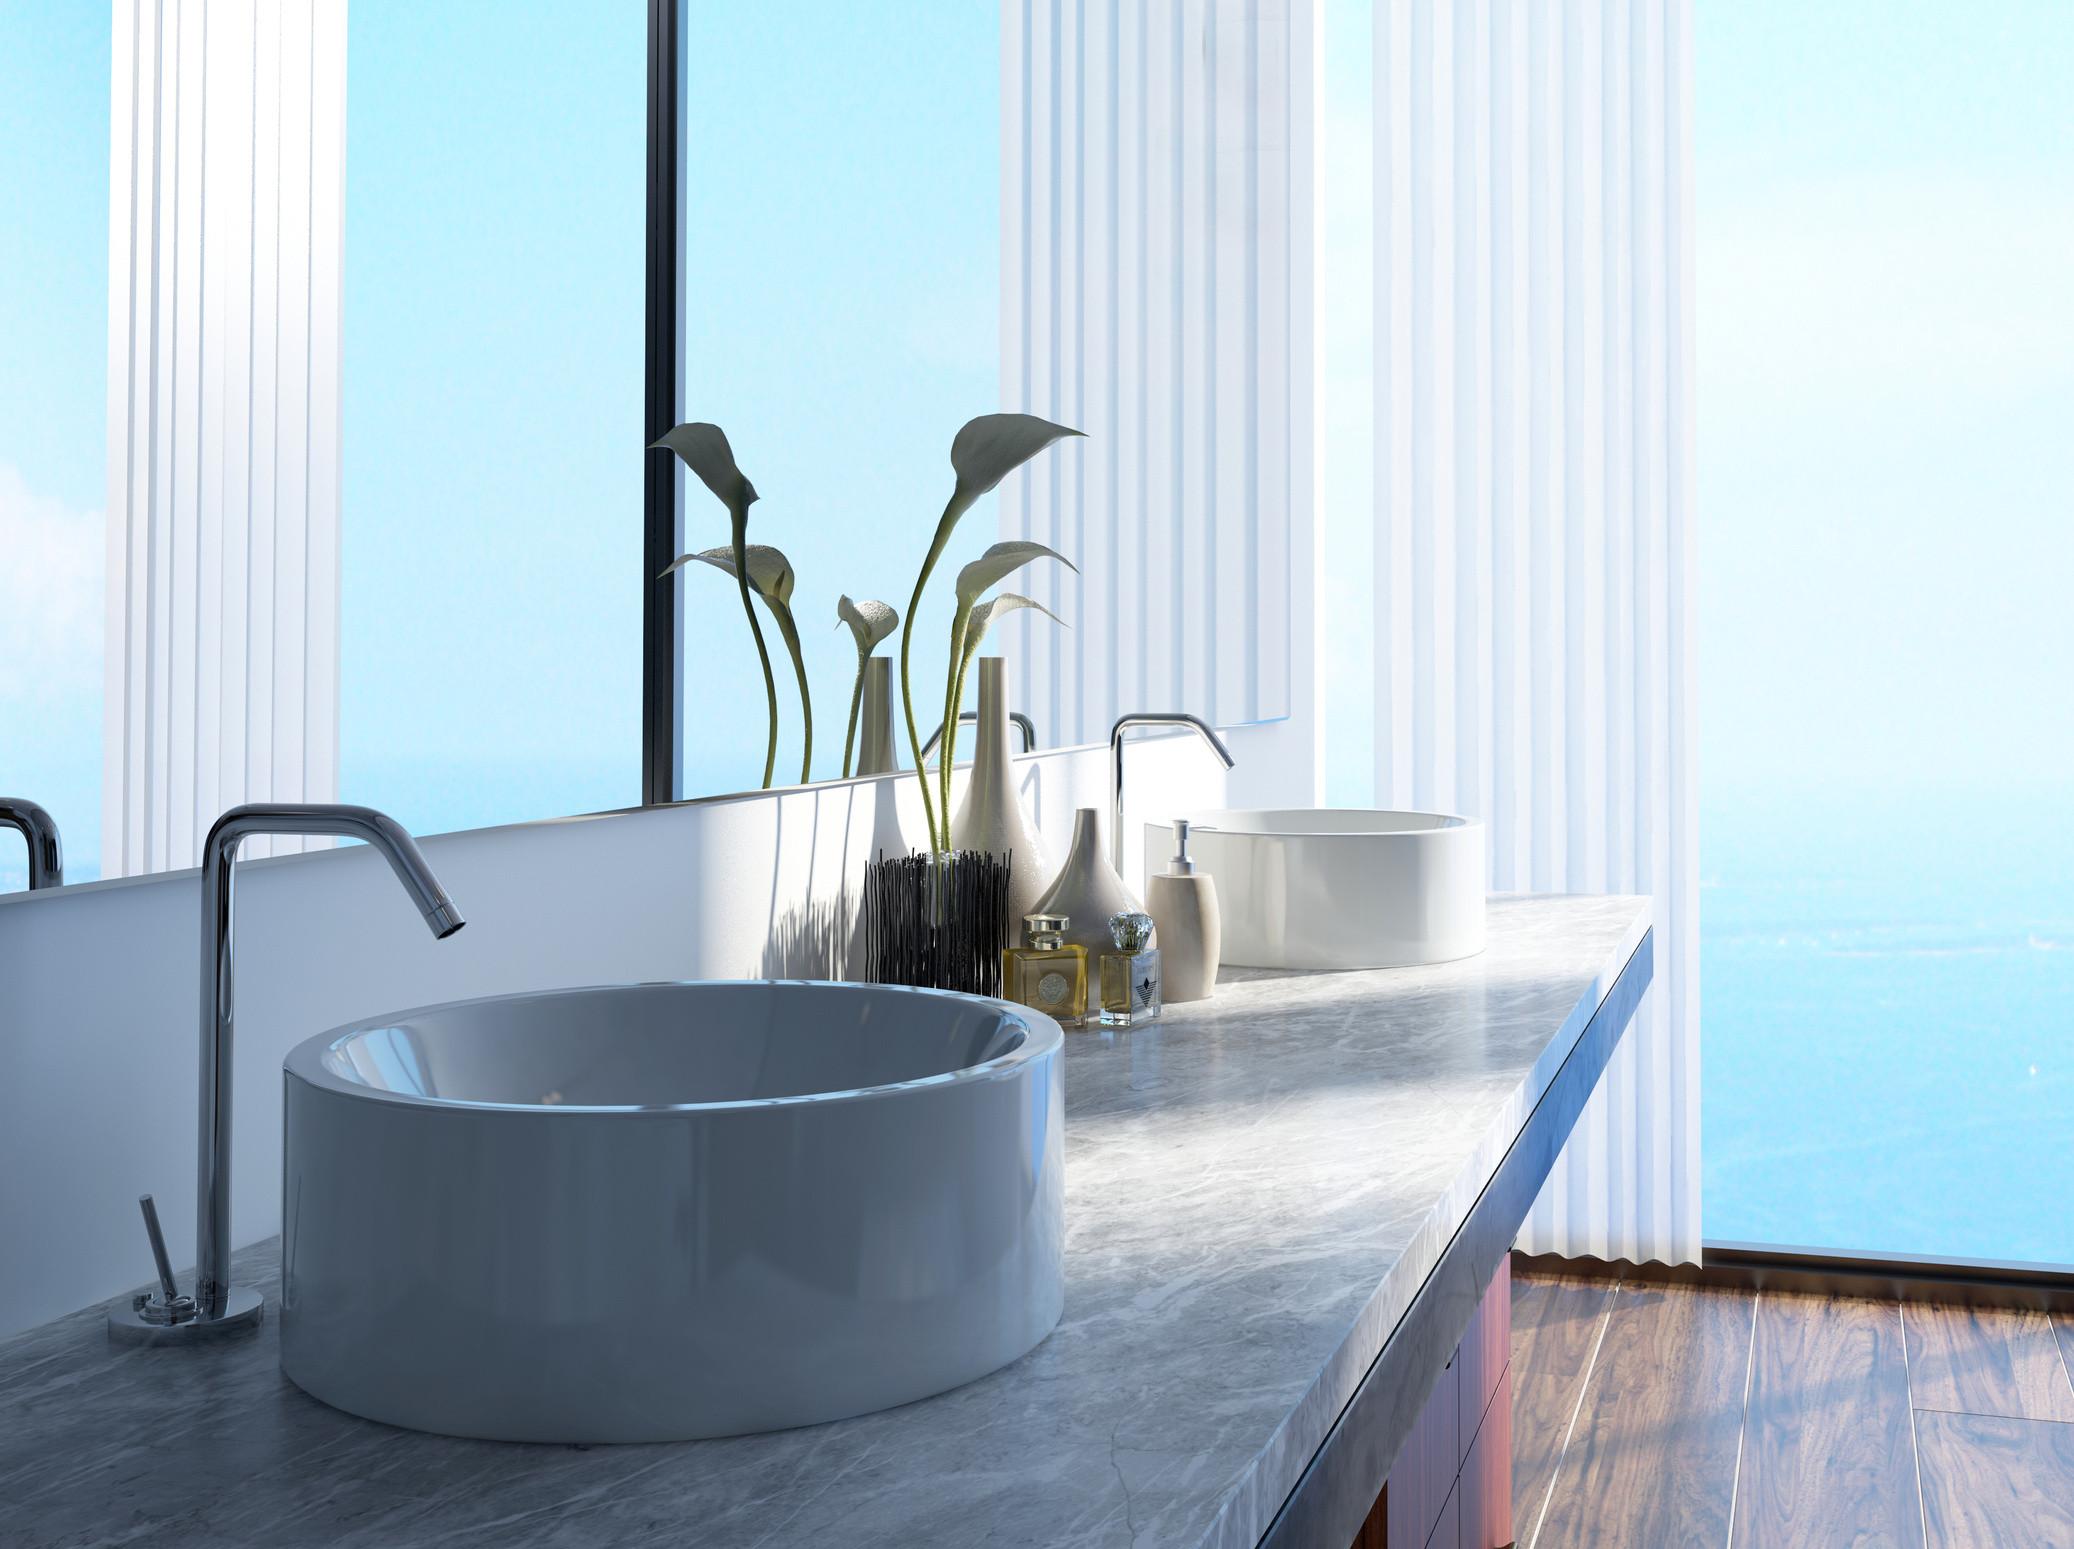 vertikaljalousien rothaupt raumausstatter. Black Bedroom Furniture Sets. Home Design Ideas